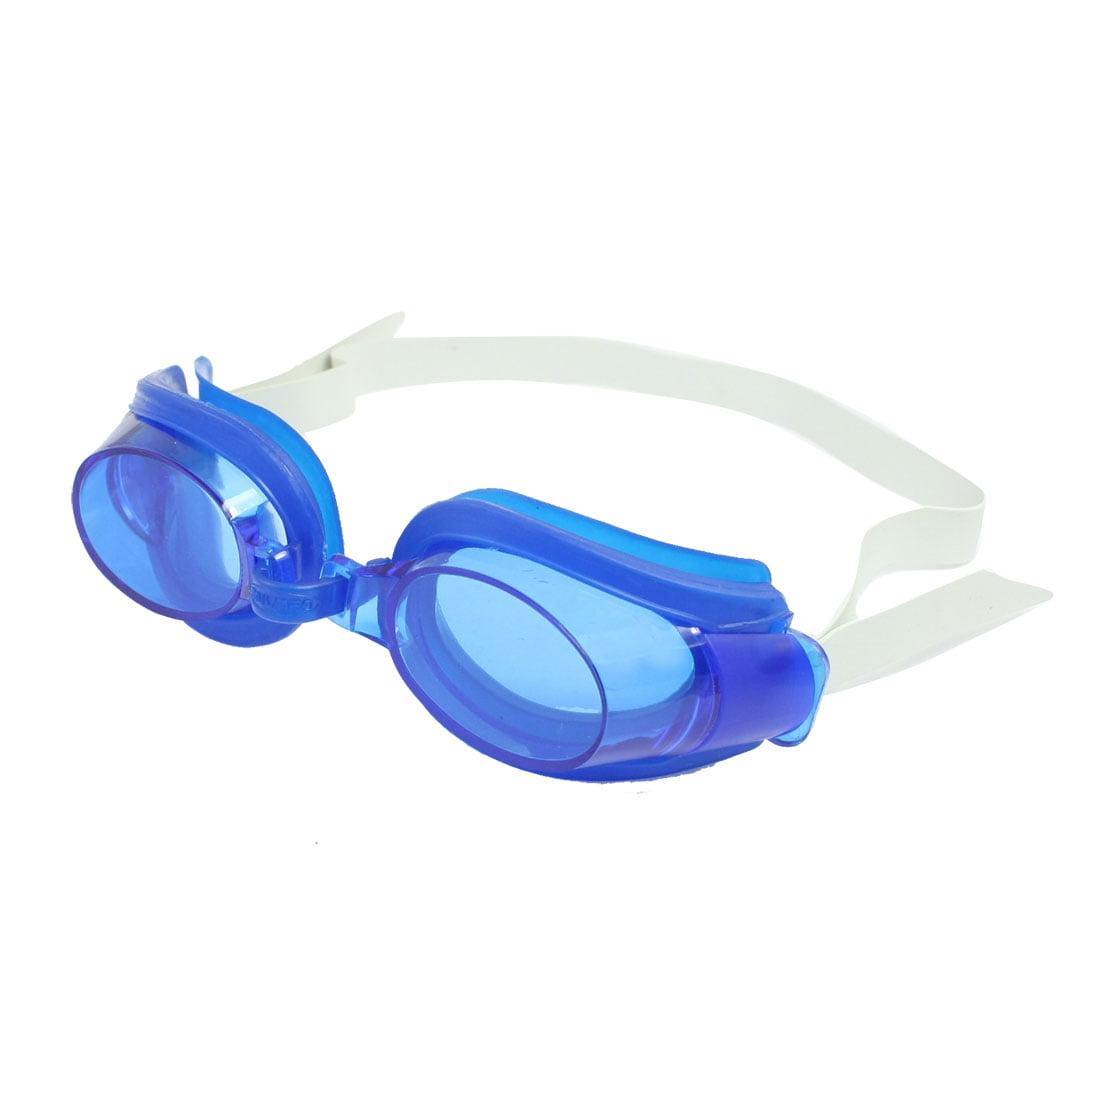 Adjustable Head Strap Swim Swimming Goggle Glasses Blue by